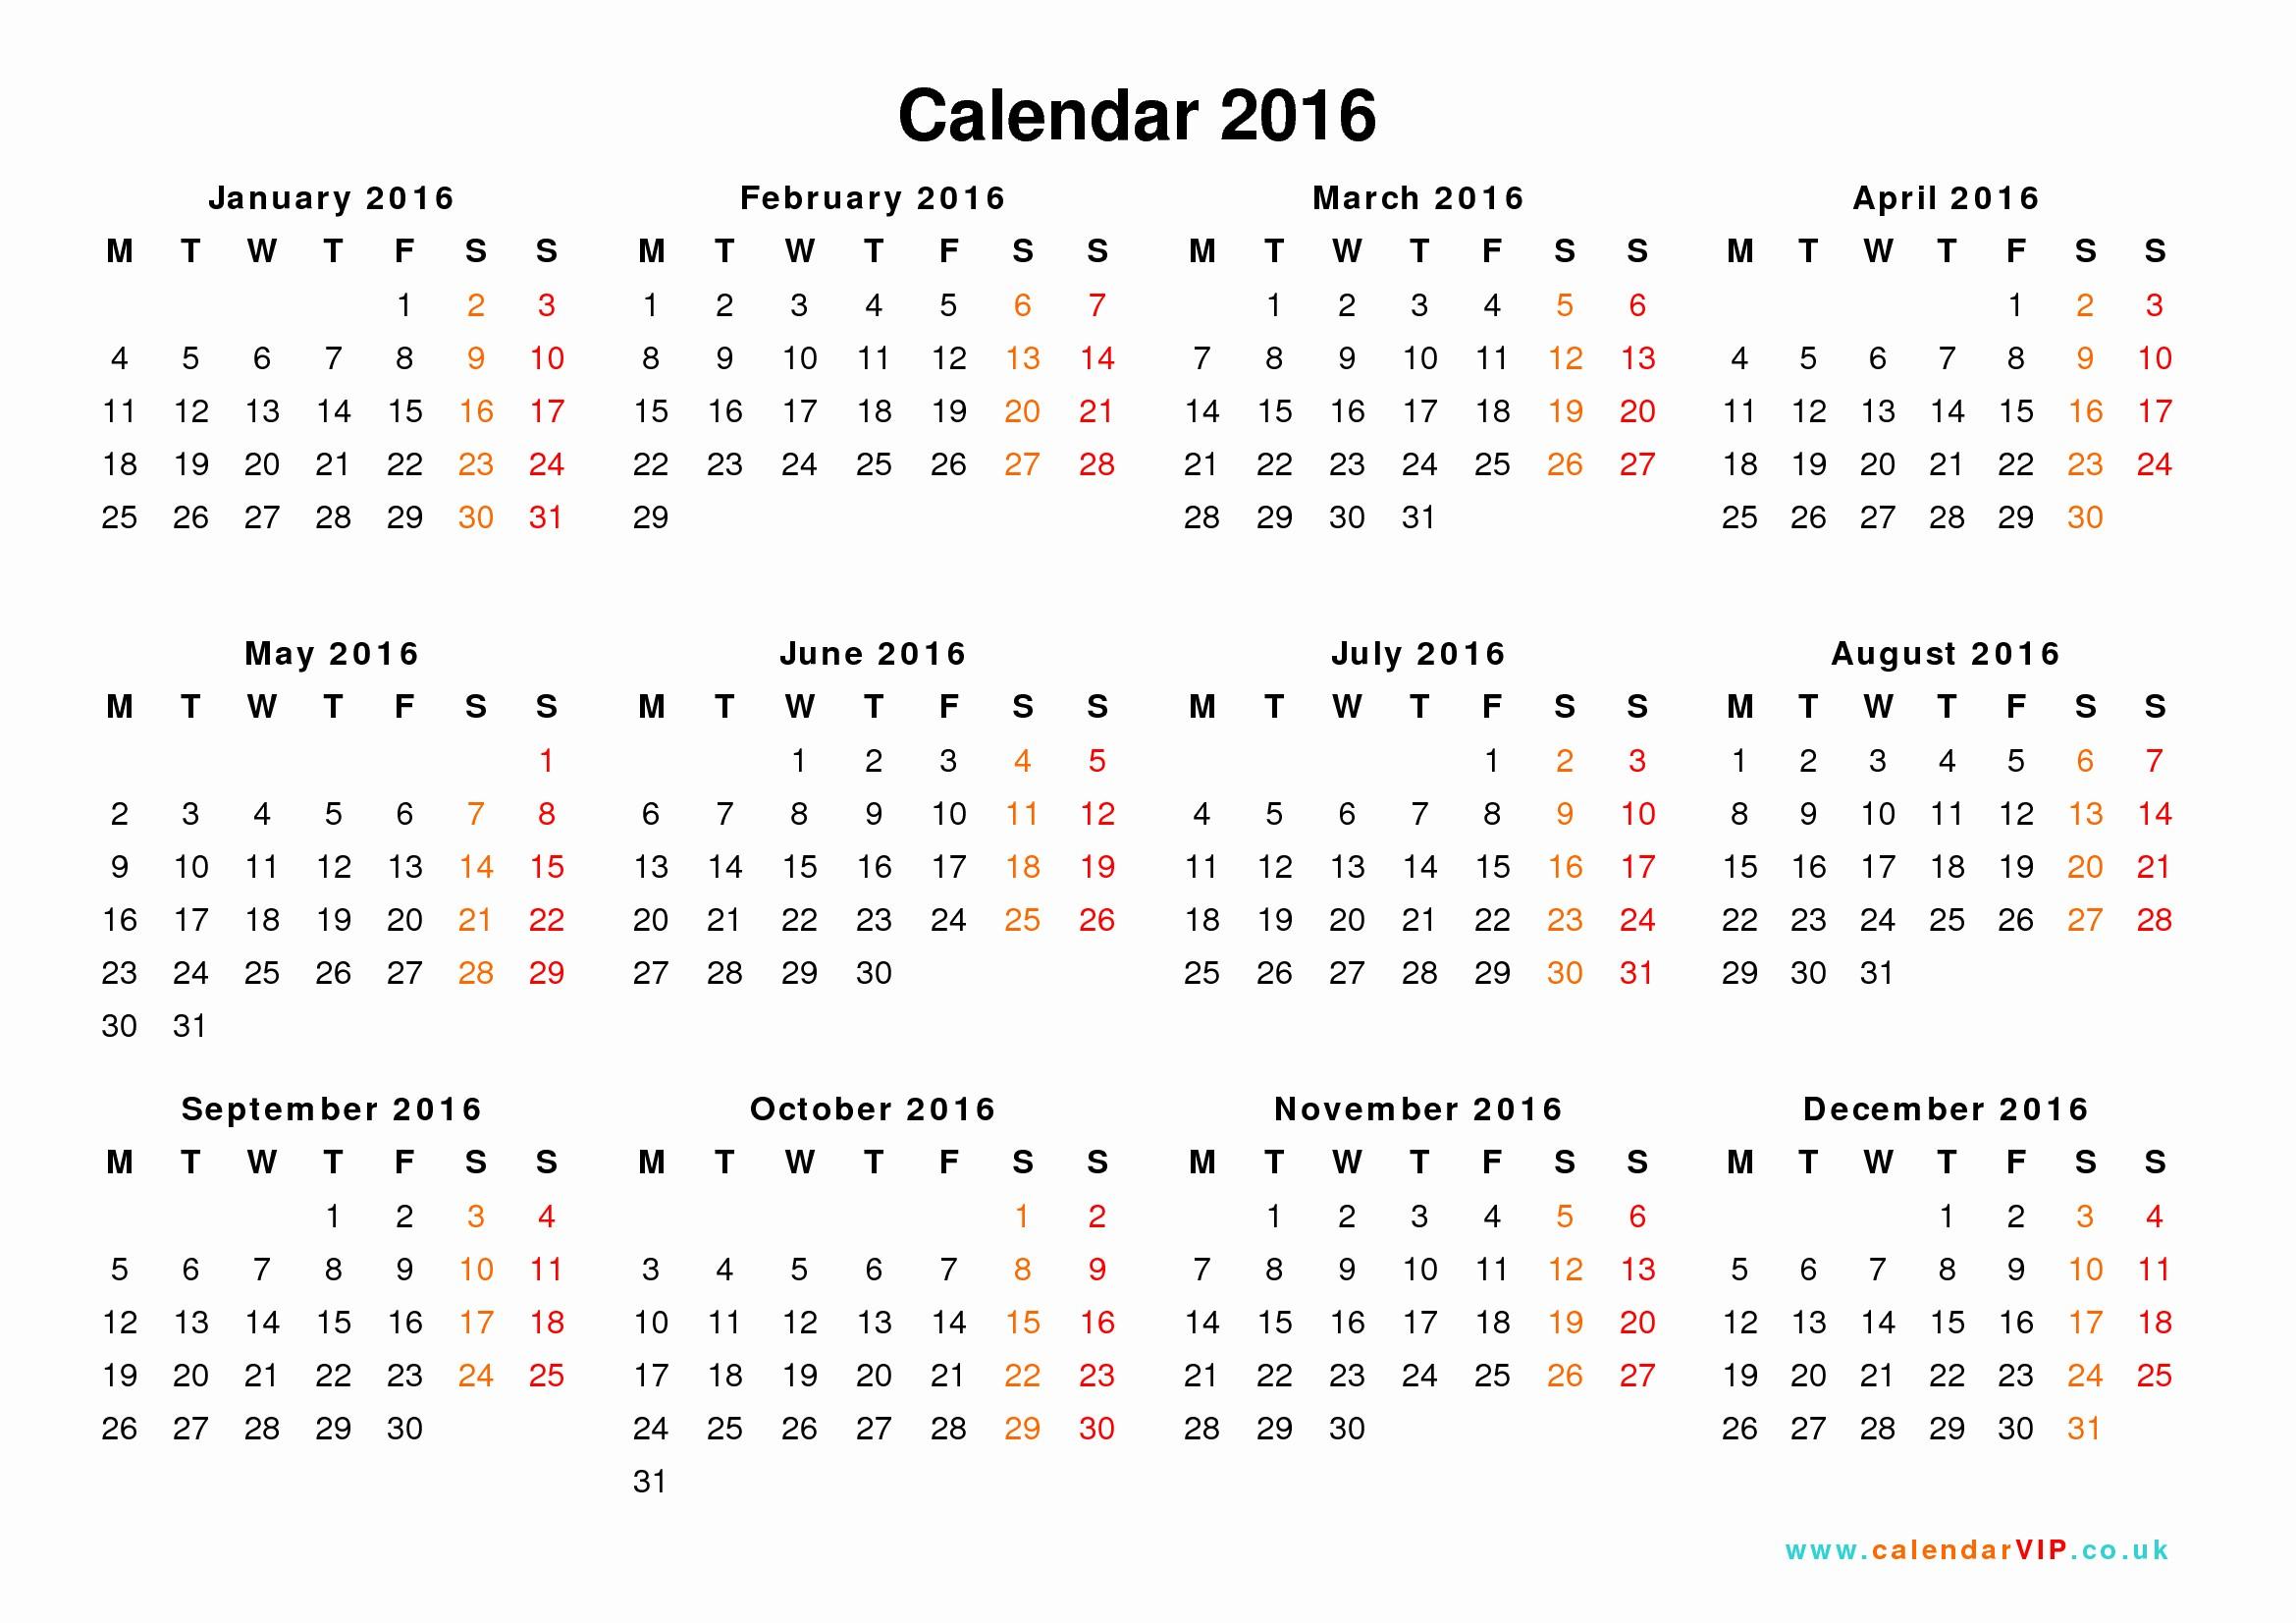 Free Year Calendar Template 2016 Inspirational Calendar 2016 Uk Free Yearly Calendar Templates for Uk